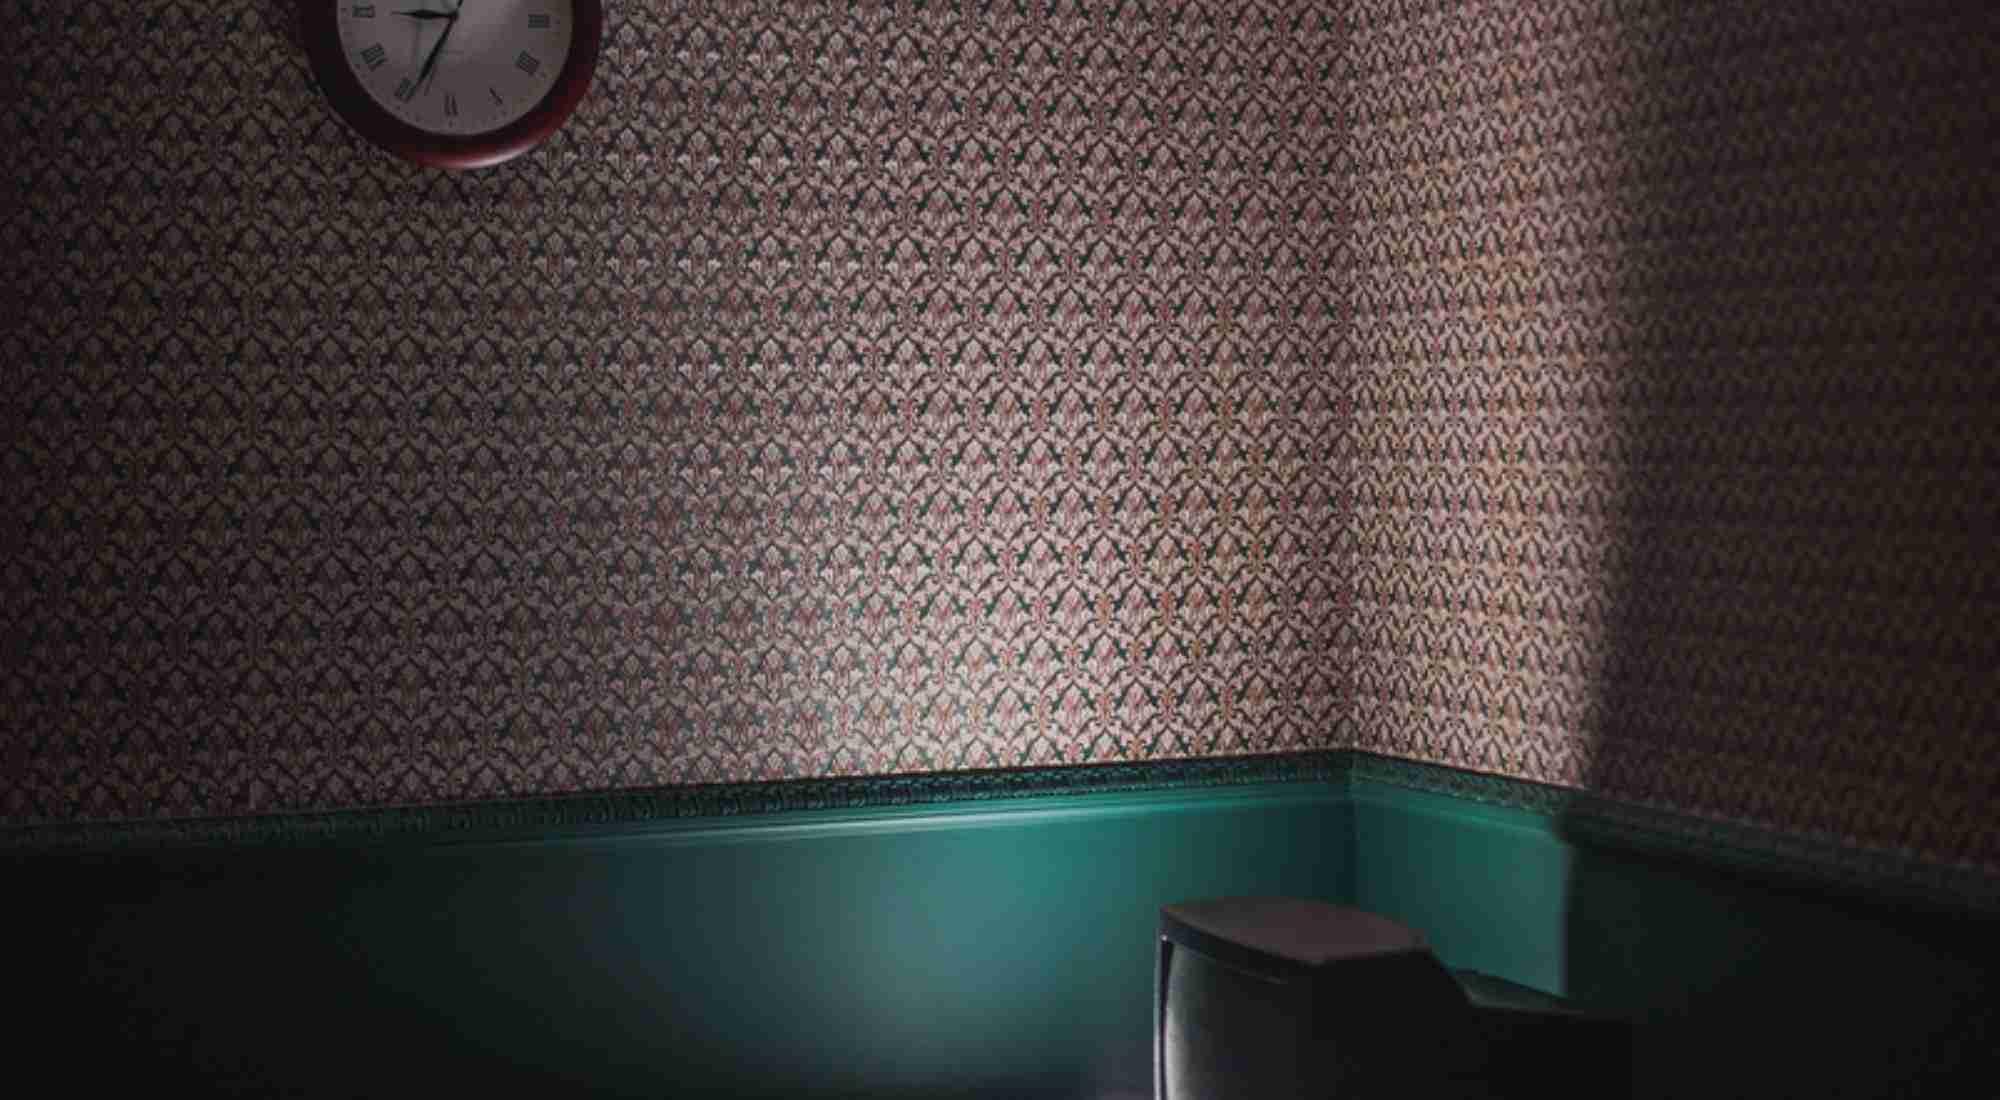 Квест 1408 в Набережных Челнах фото 1